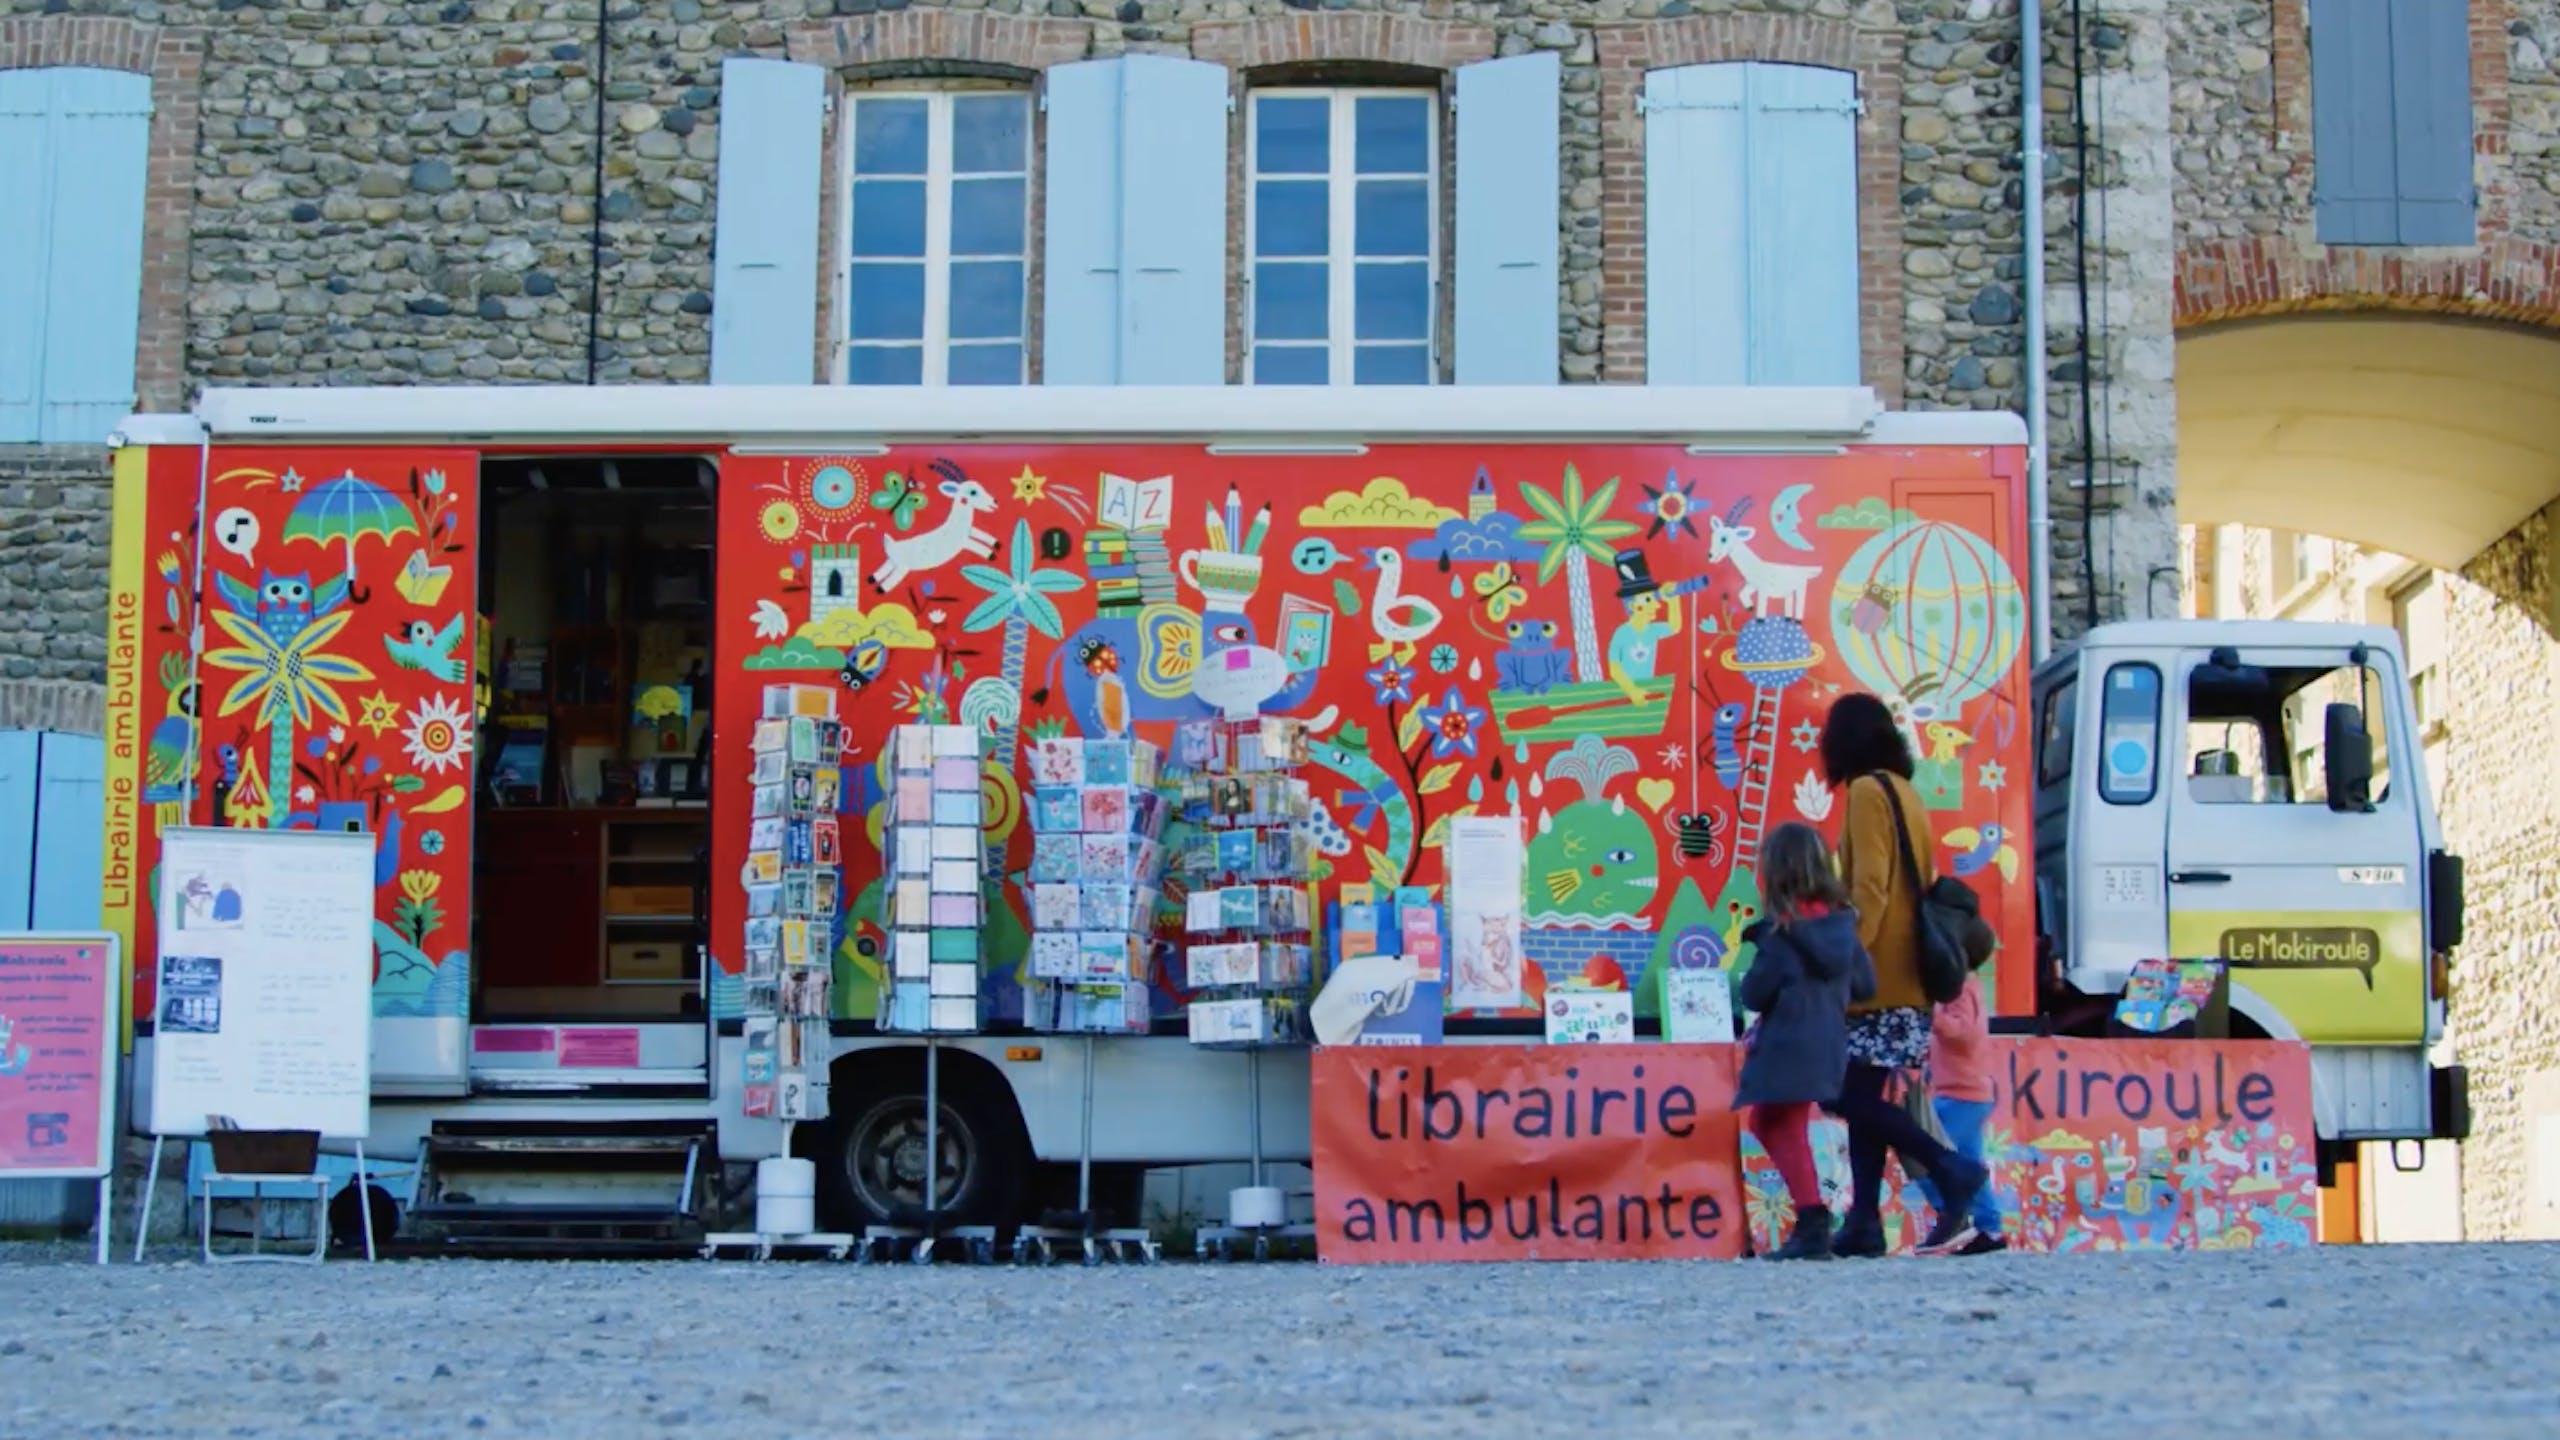 Mokiroule librairie ambulante